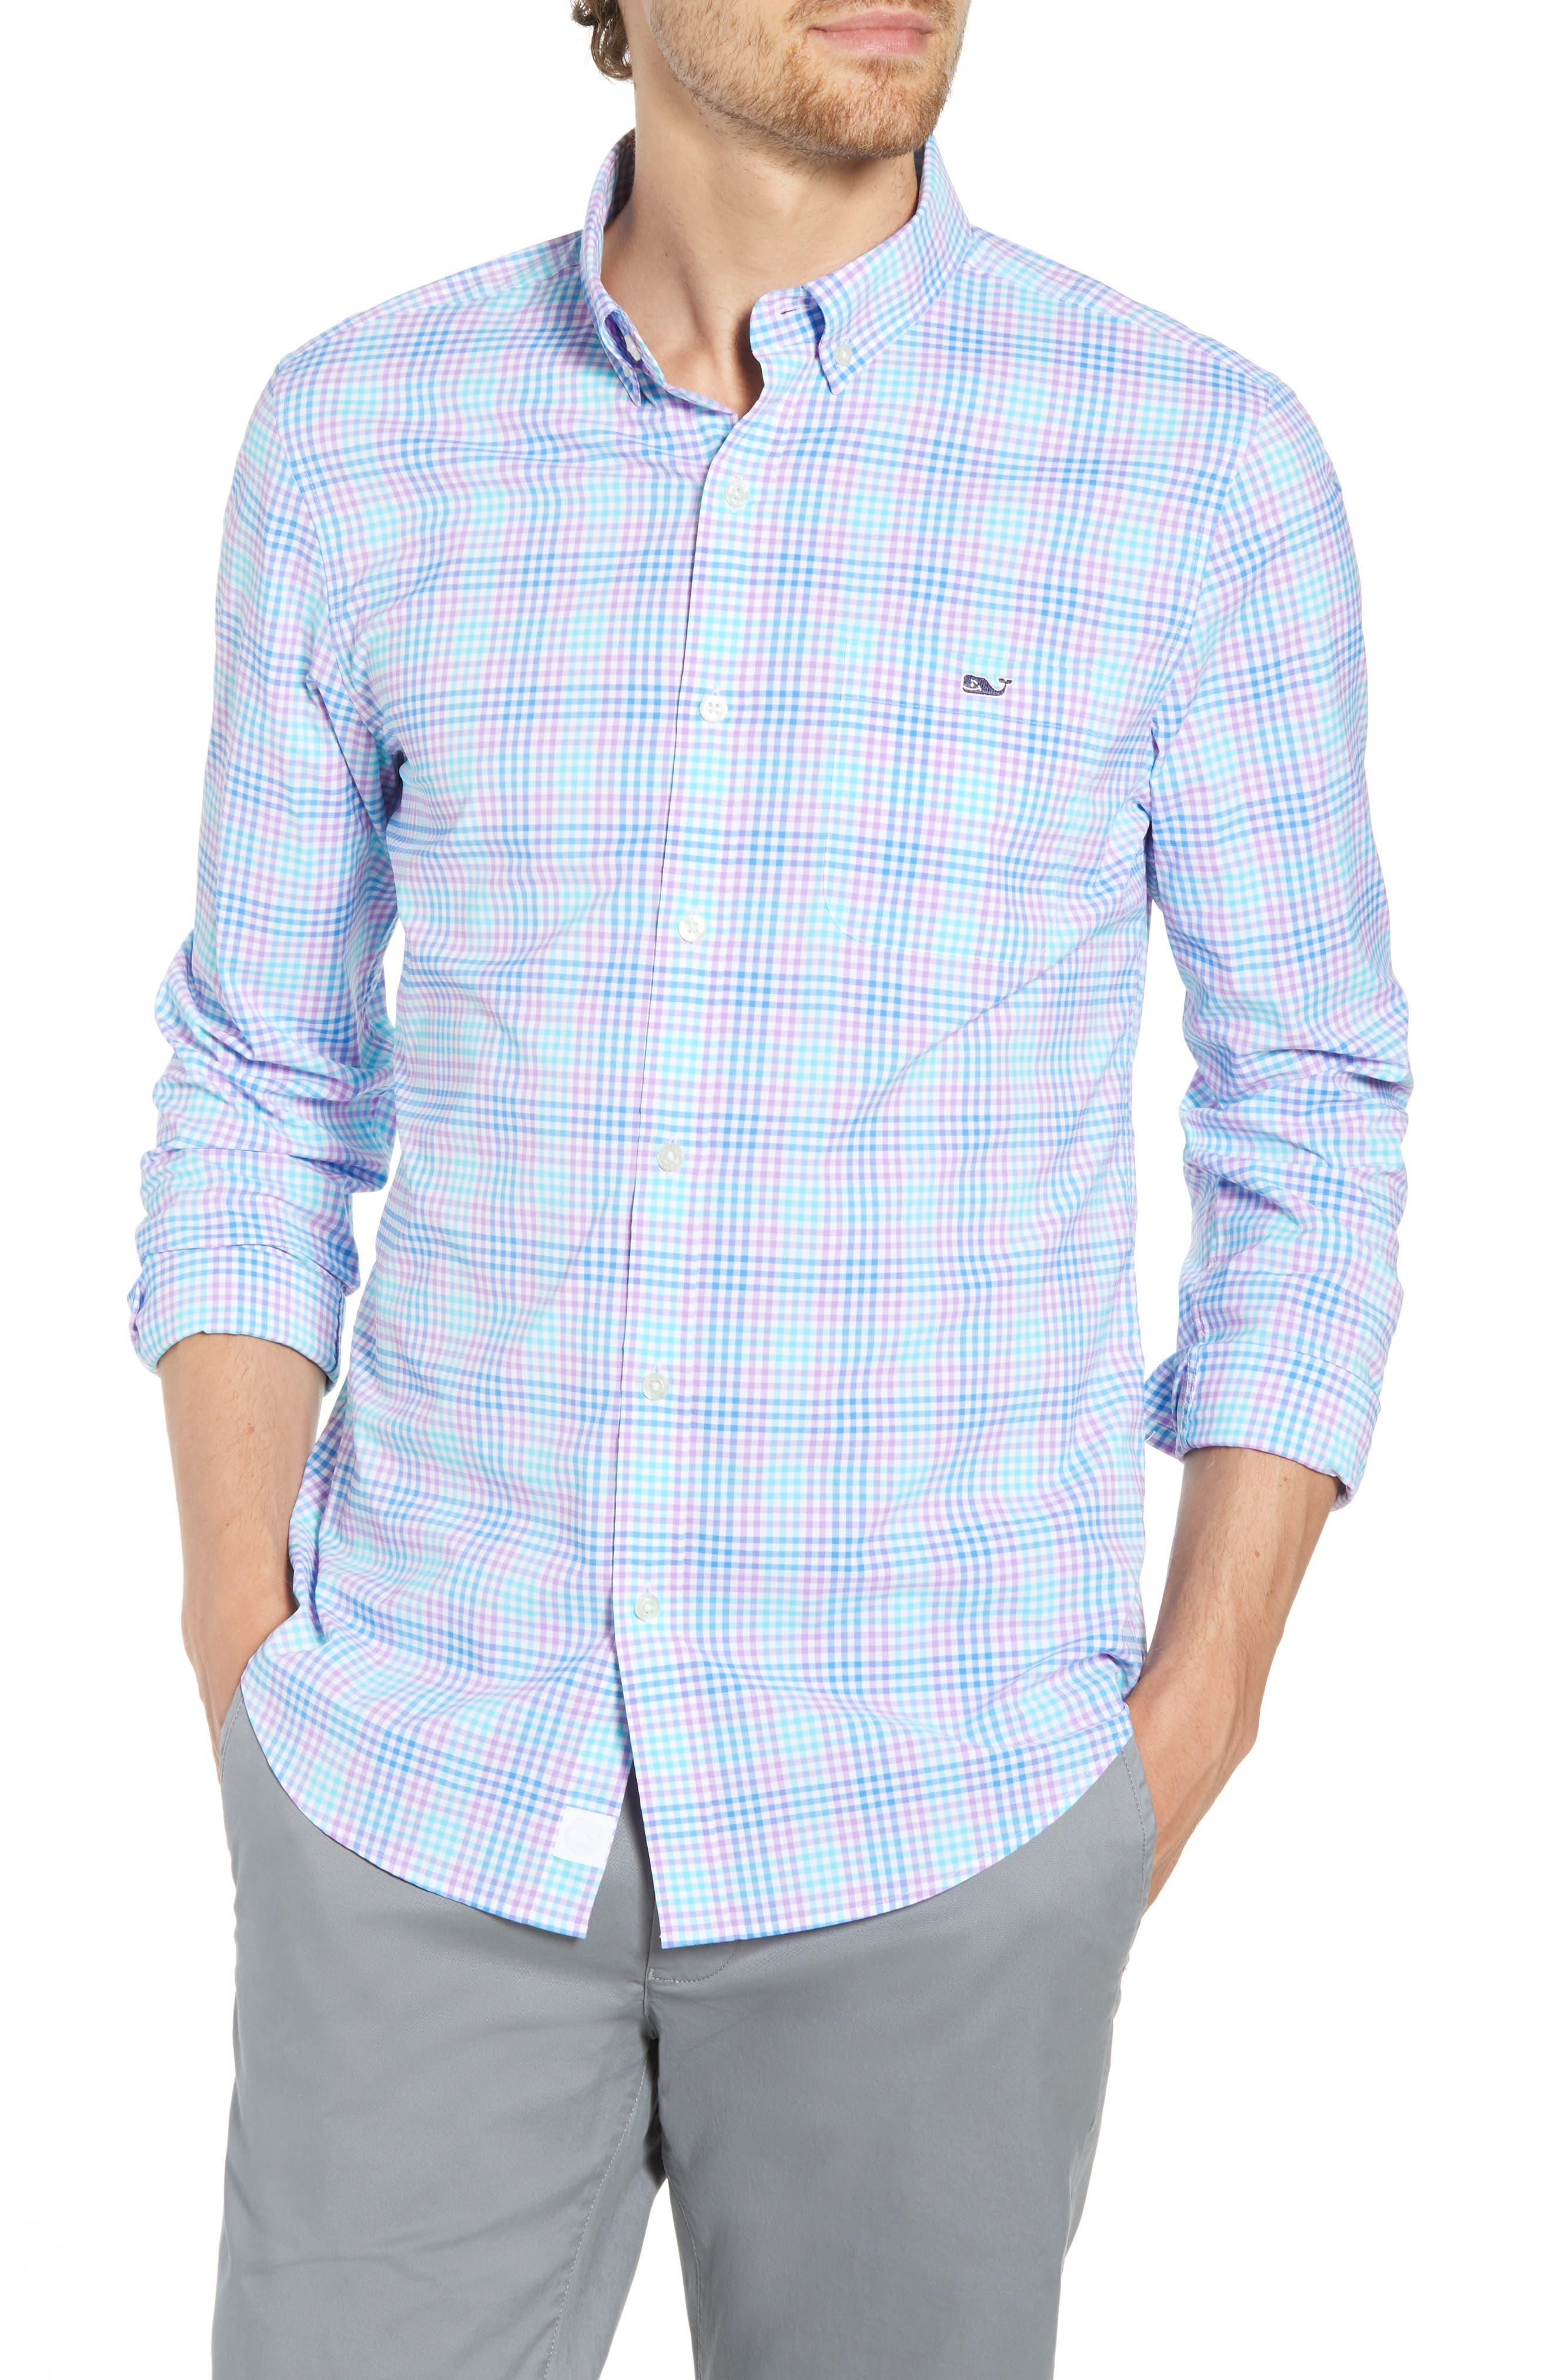 Ridge Hill Slim Fit Check Performance Sport Shirt,                             Main thumbnail 1, color,                             Turquoise